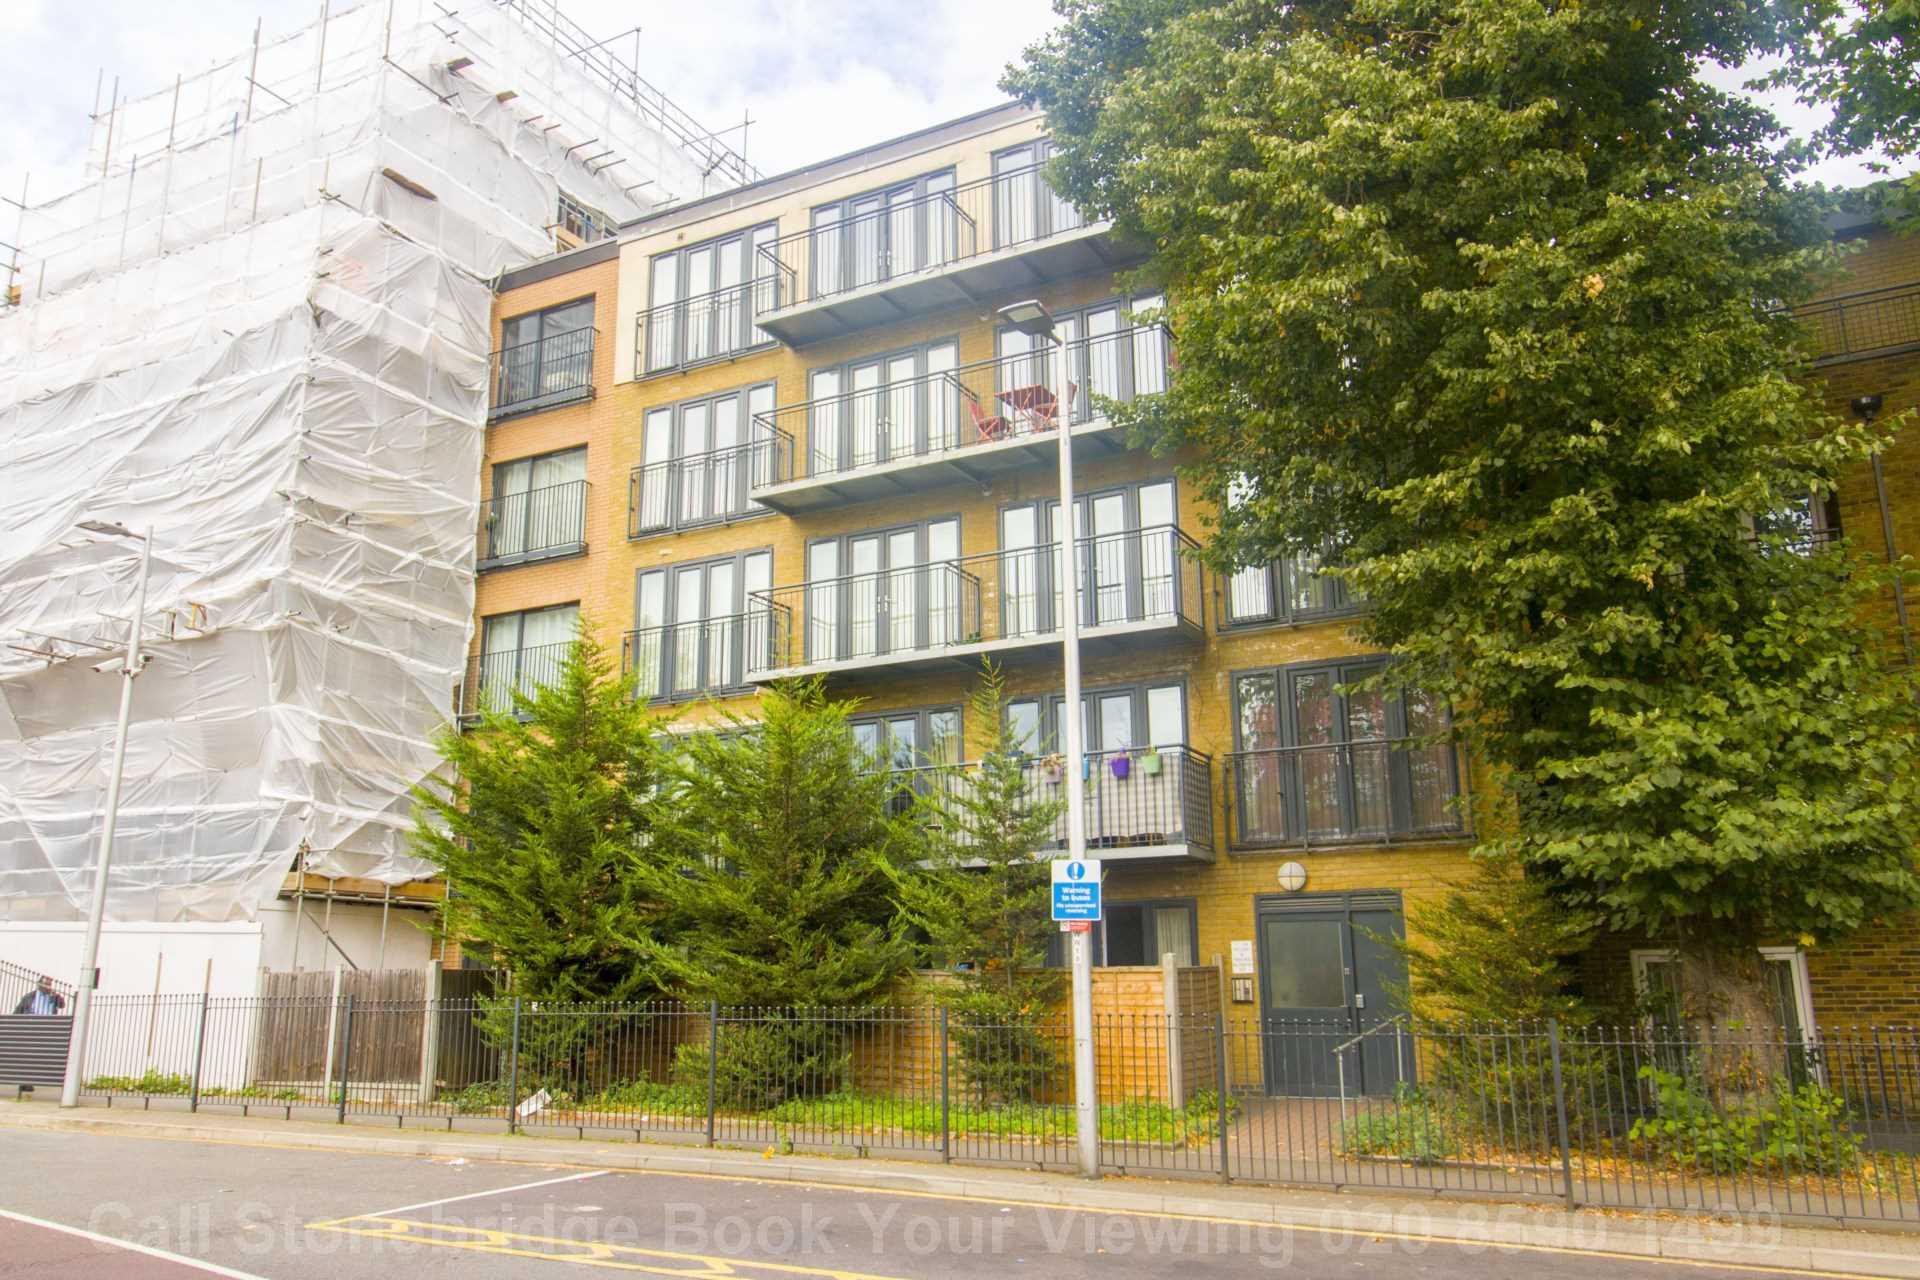 Fari Court, Tower Mews, London E17, Image 2